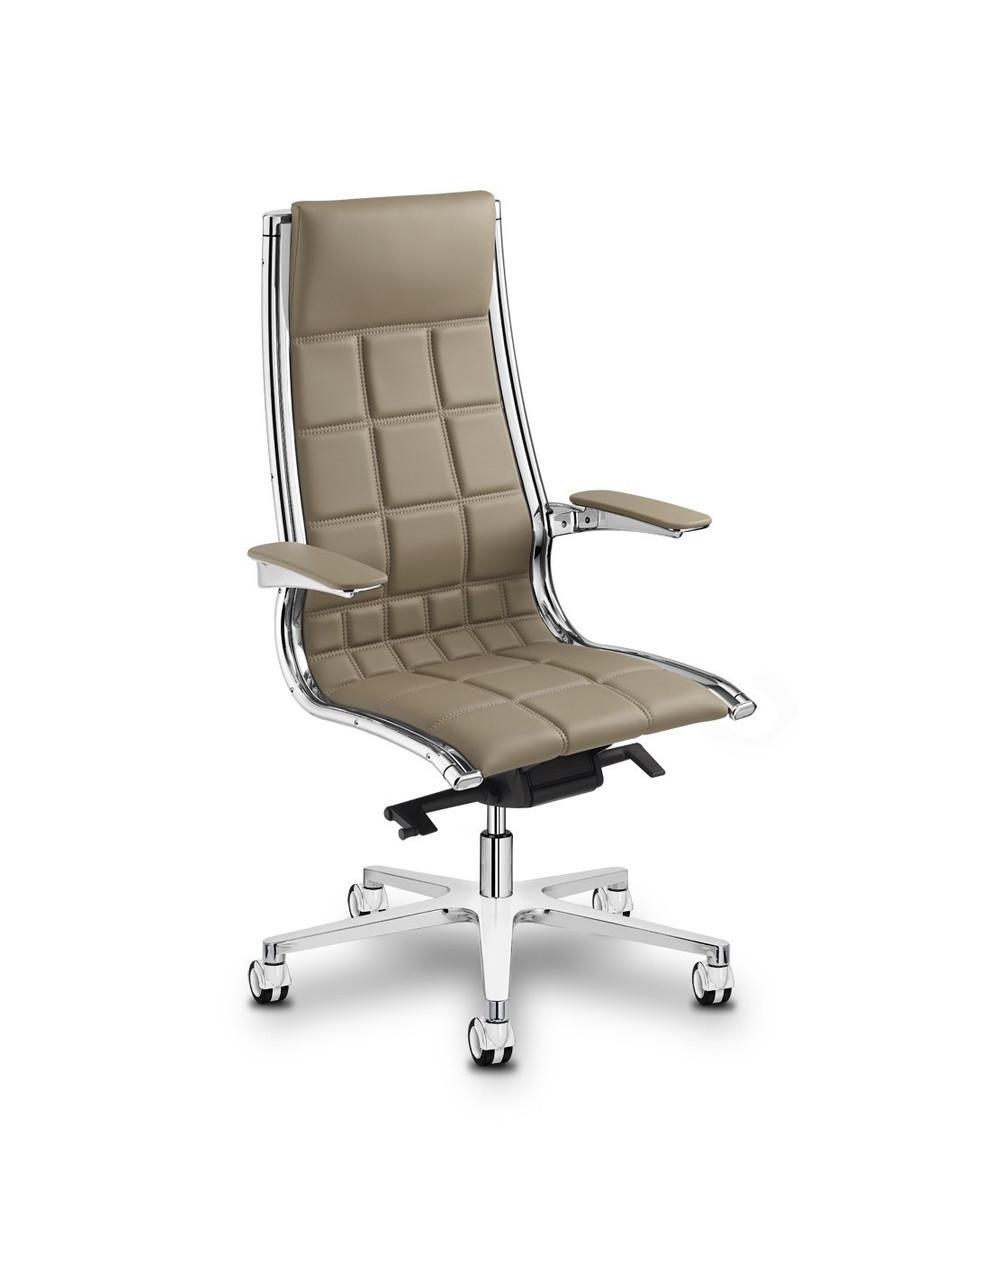 Кресло Sit on it 2 для руководителя кожаное